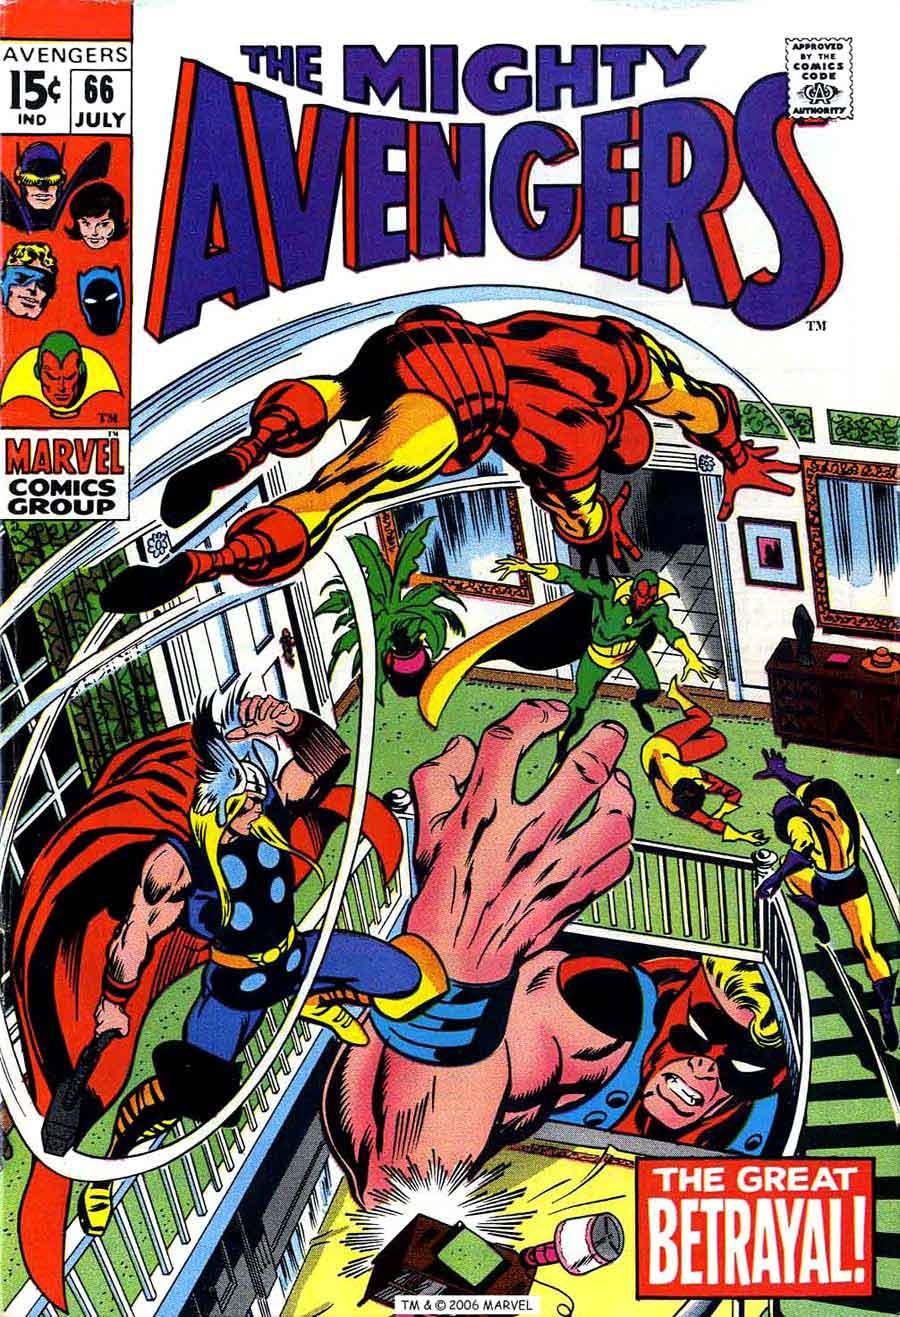 Avengers v1 #66 marvel comic book cover art by Barry Windsor Smith